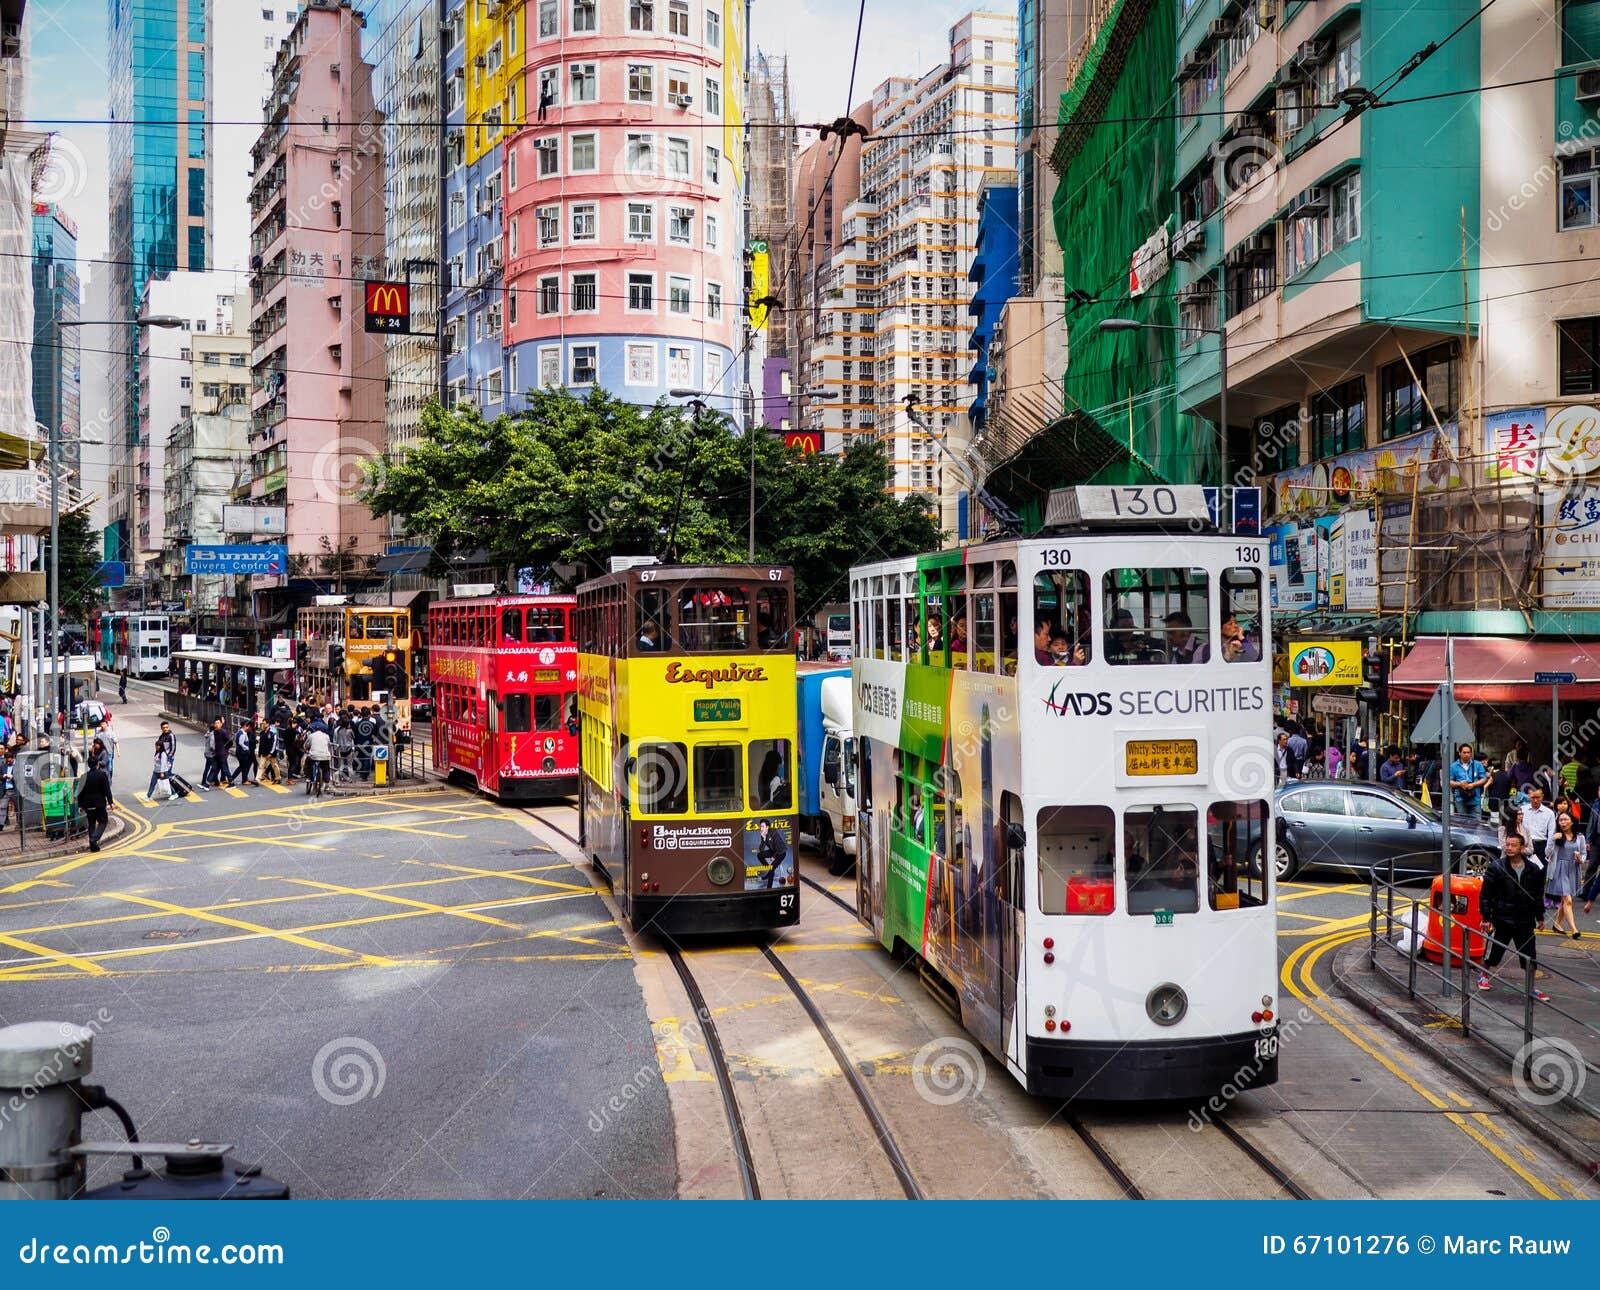 Hong Kong Tramways   Ding Ding   tranvías del autobús de dos pisos